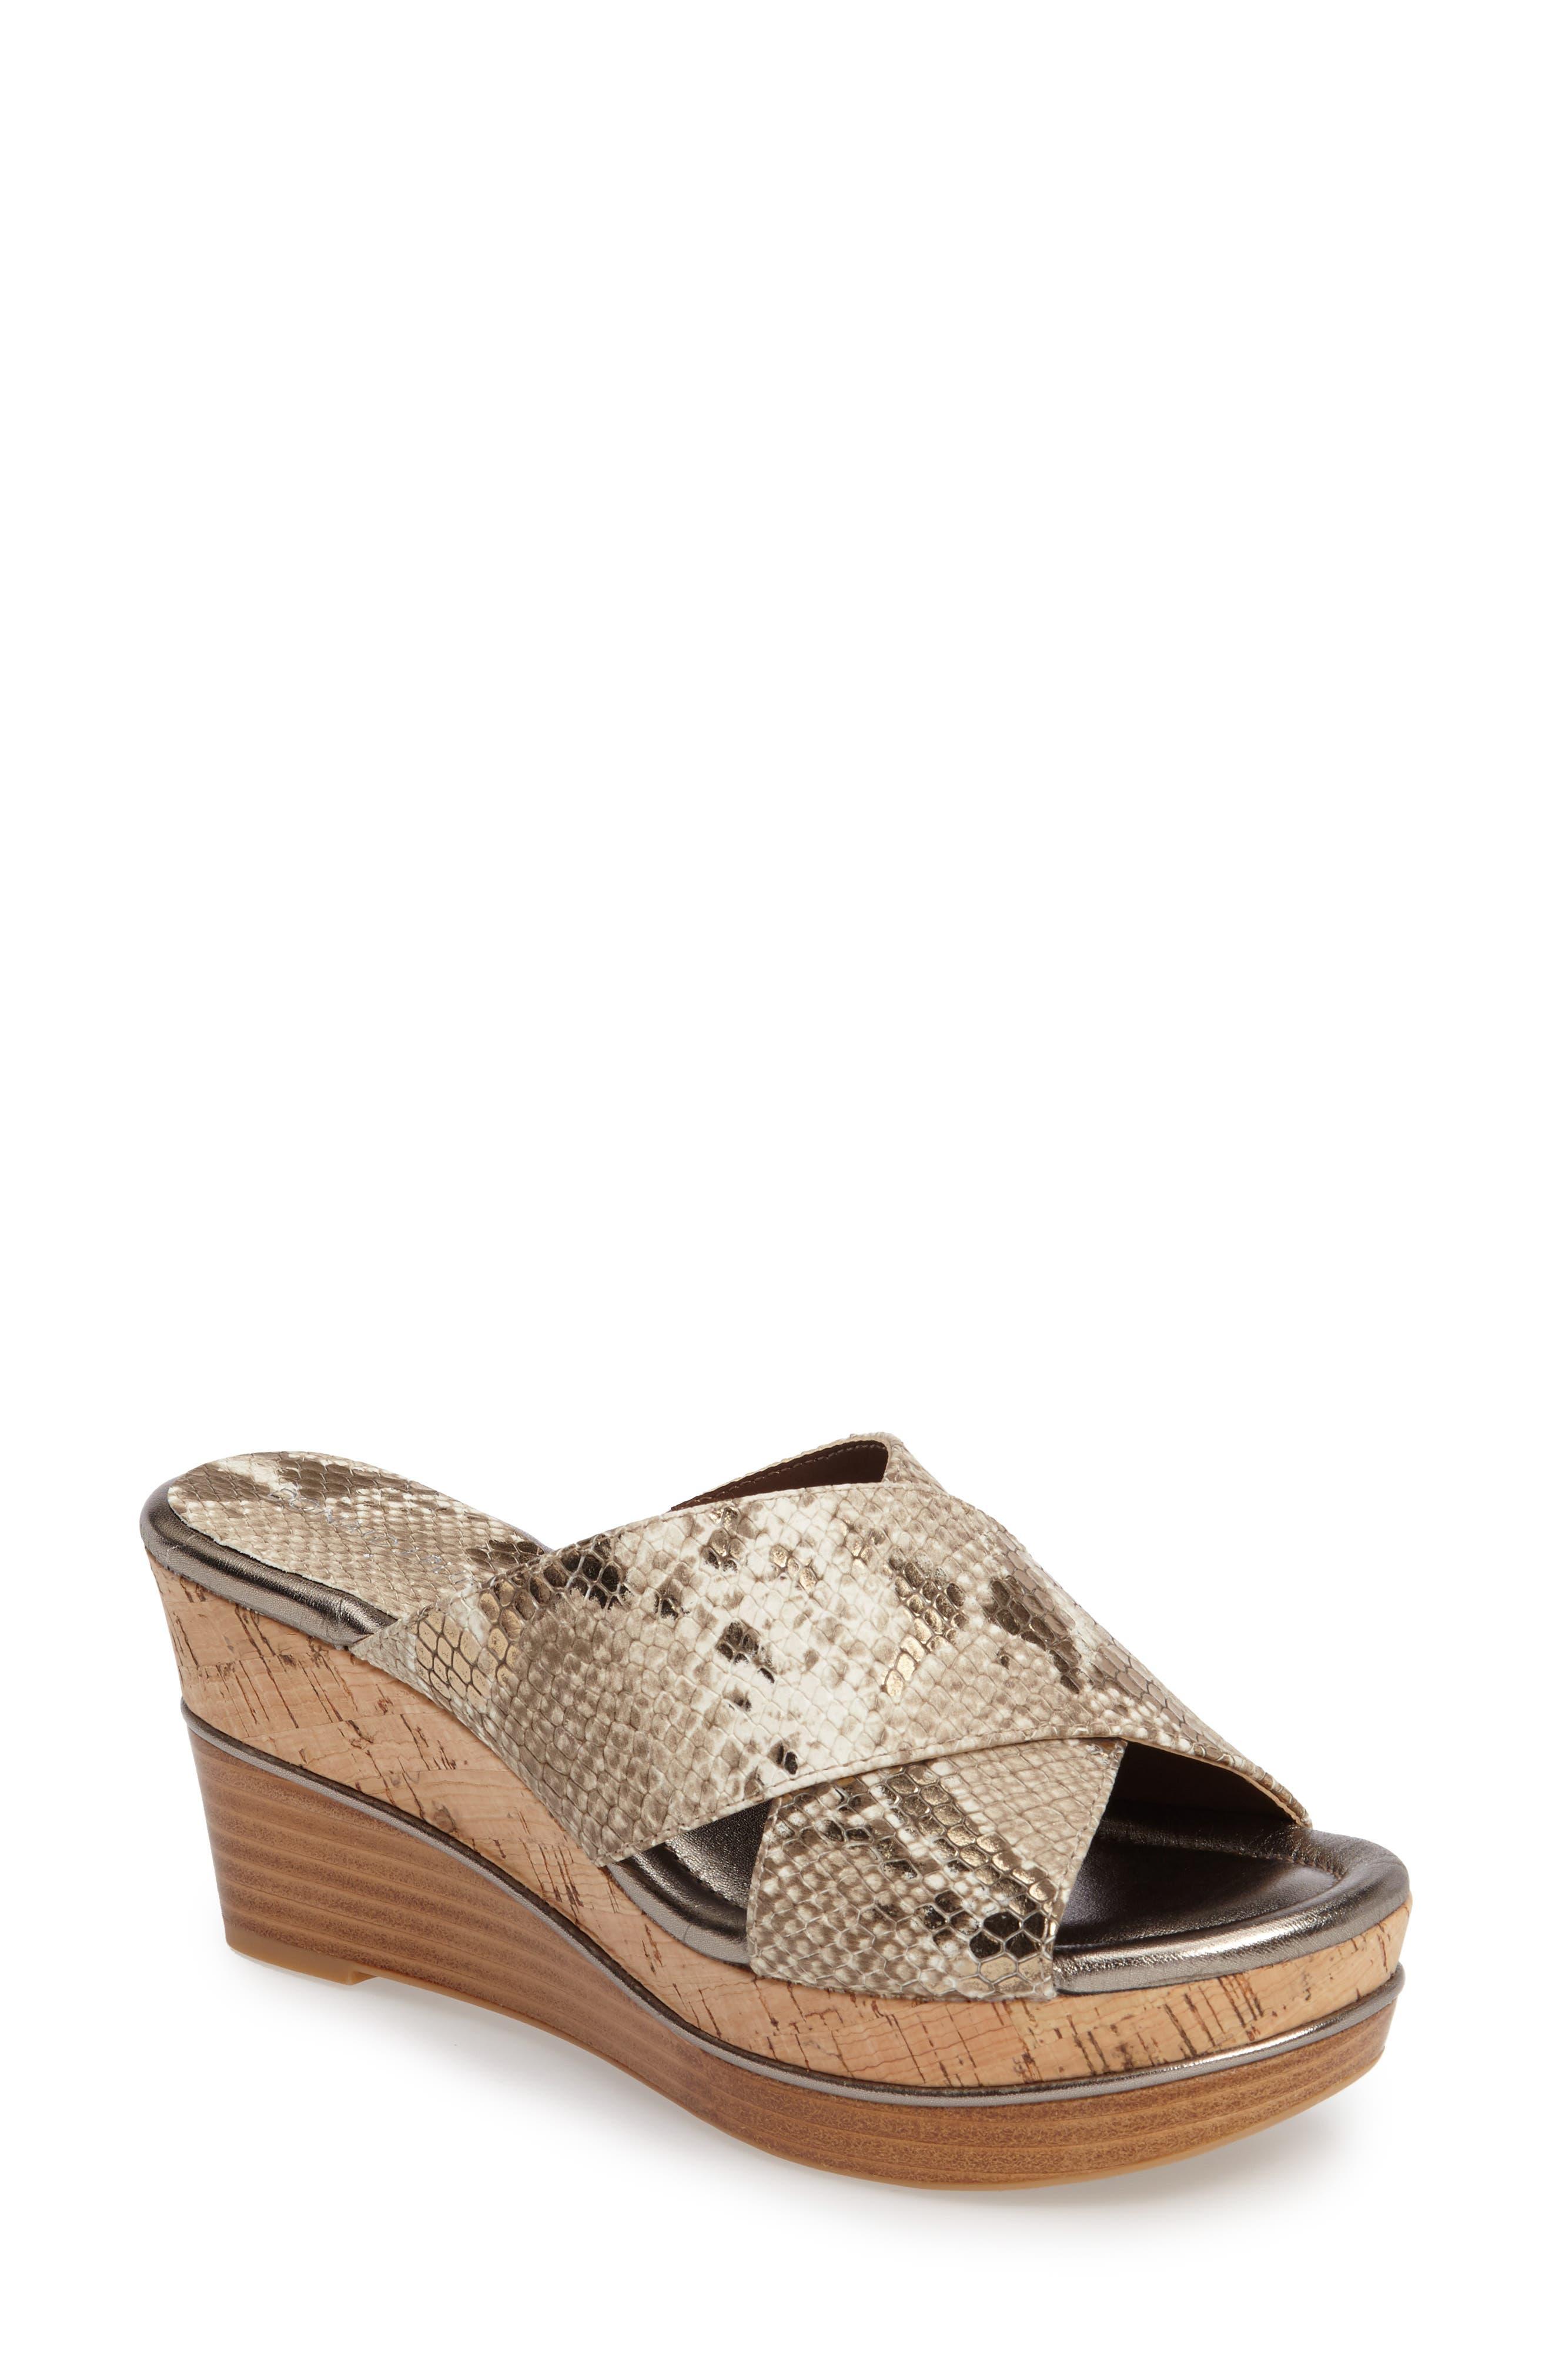 Donald J Pliner 'Dani' Crisscross Wedge Sandal,                         Main,                         color, Light Bronze Print Leather